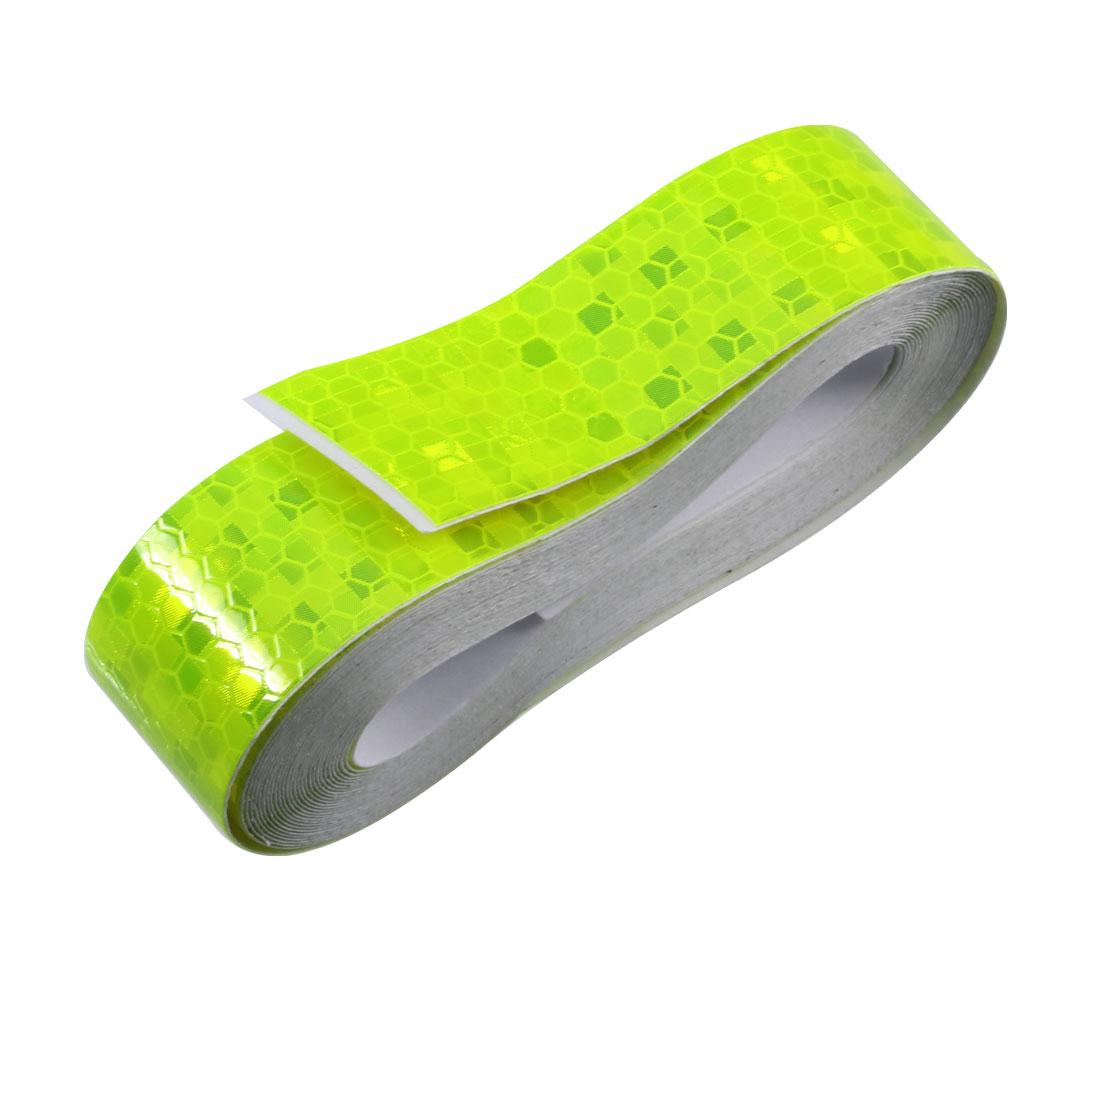 Honeycomb Reflective Warning Tape Film Sticker Yellow 25mm Width 5m Long